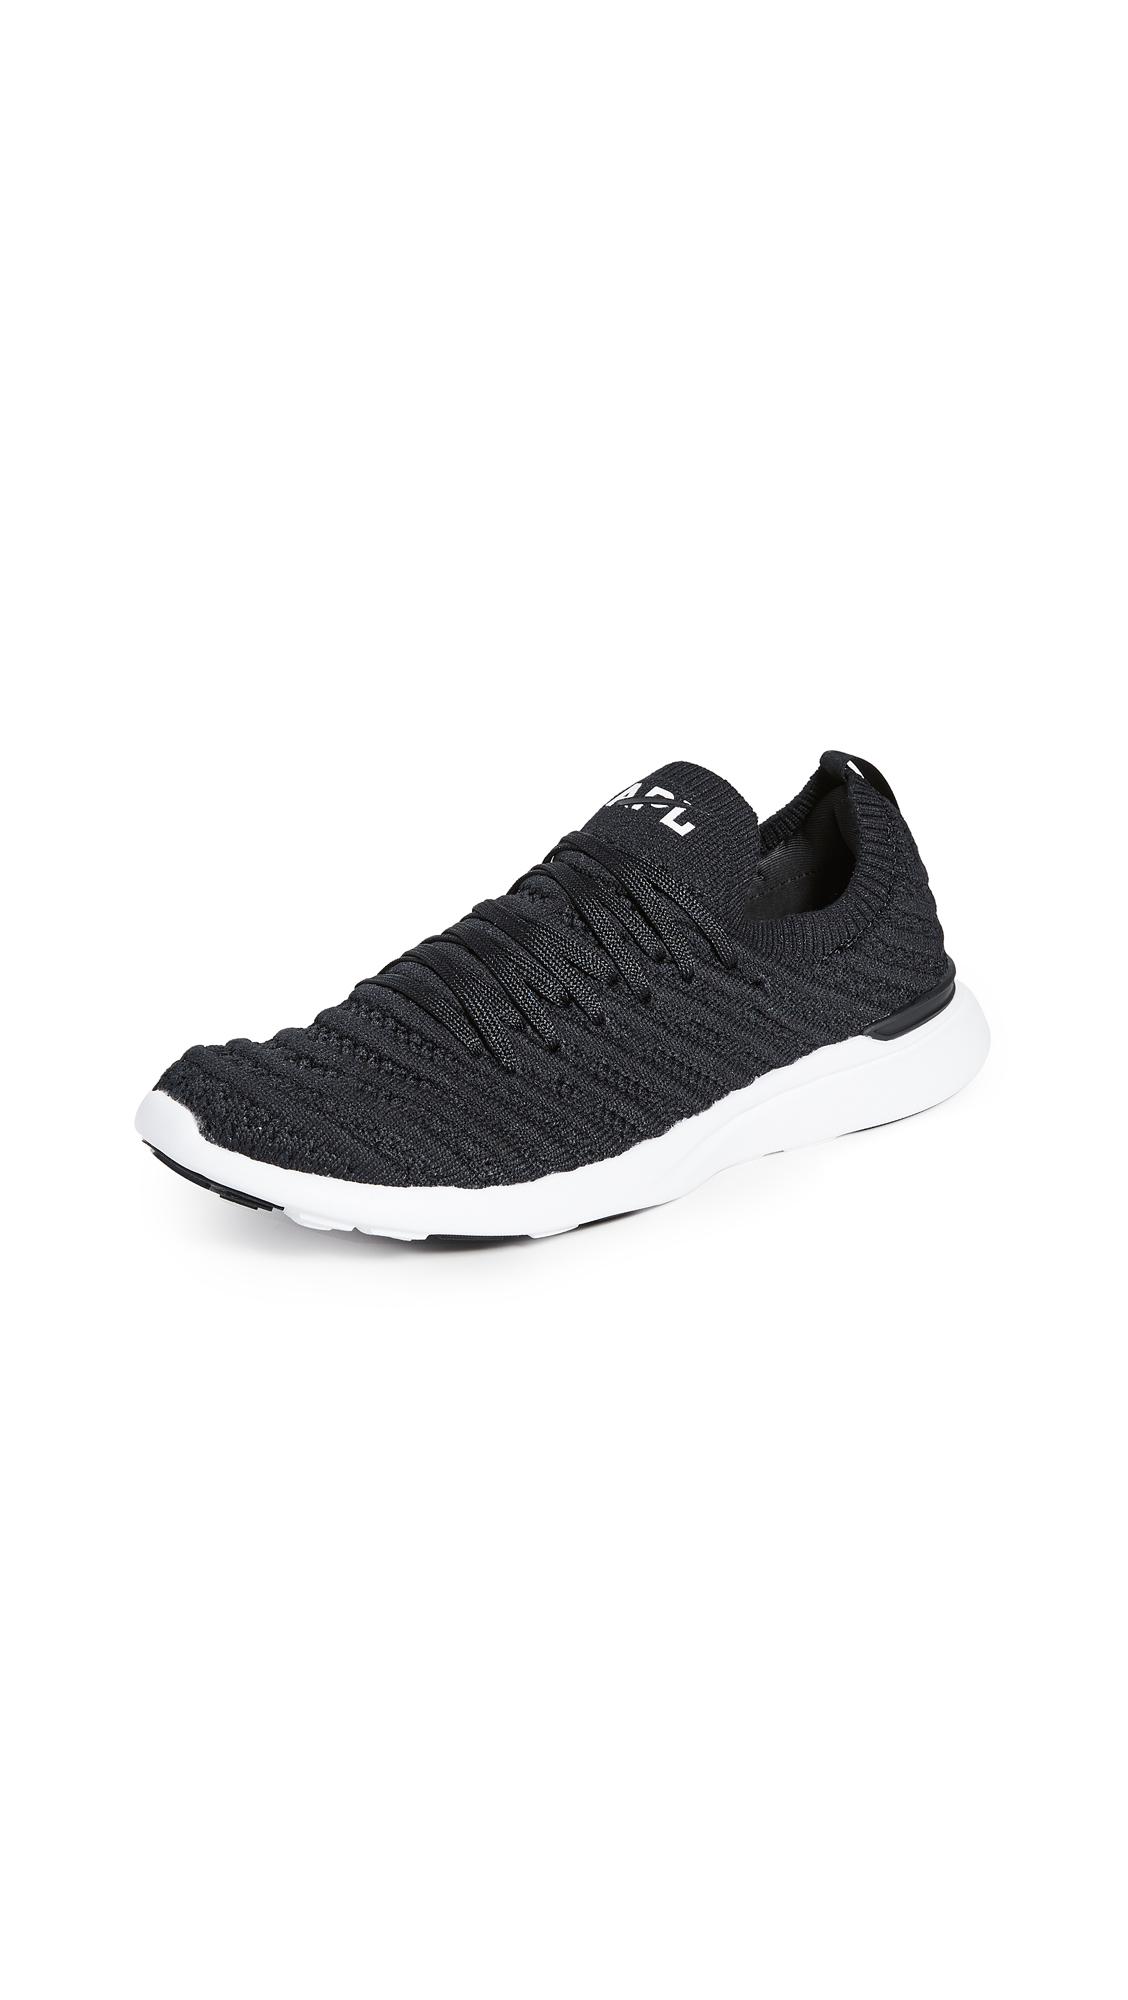 Buy APL: Athletic Propulsion Labs Techloom Wave Sneakers online, shop APL: Athletic Propulsion Labs